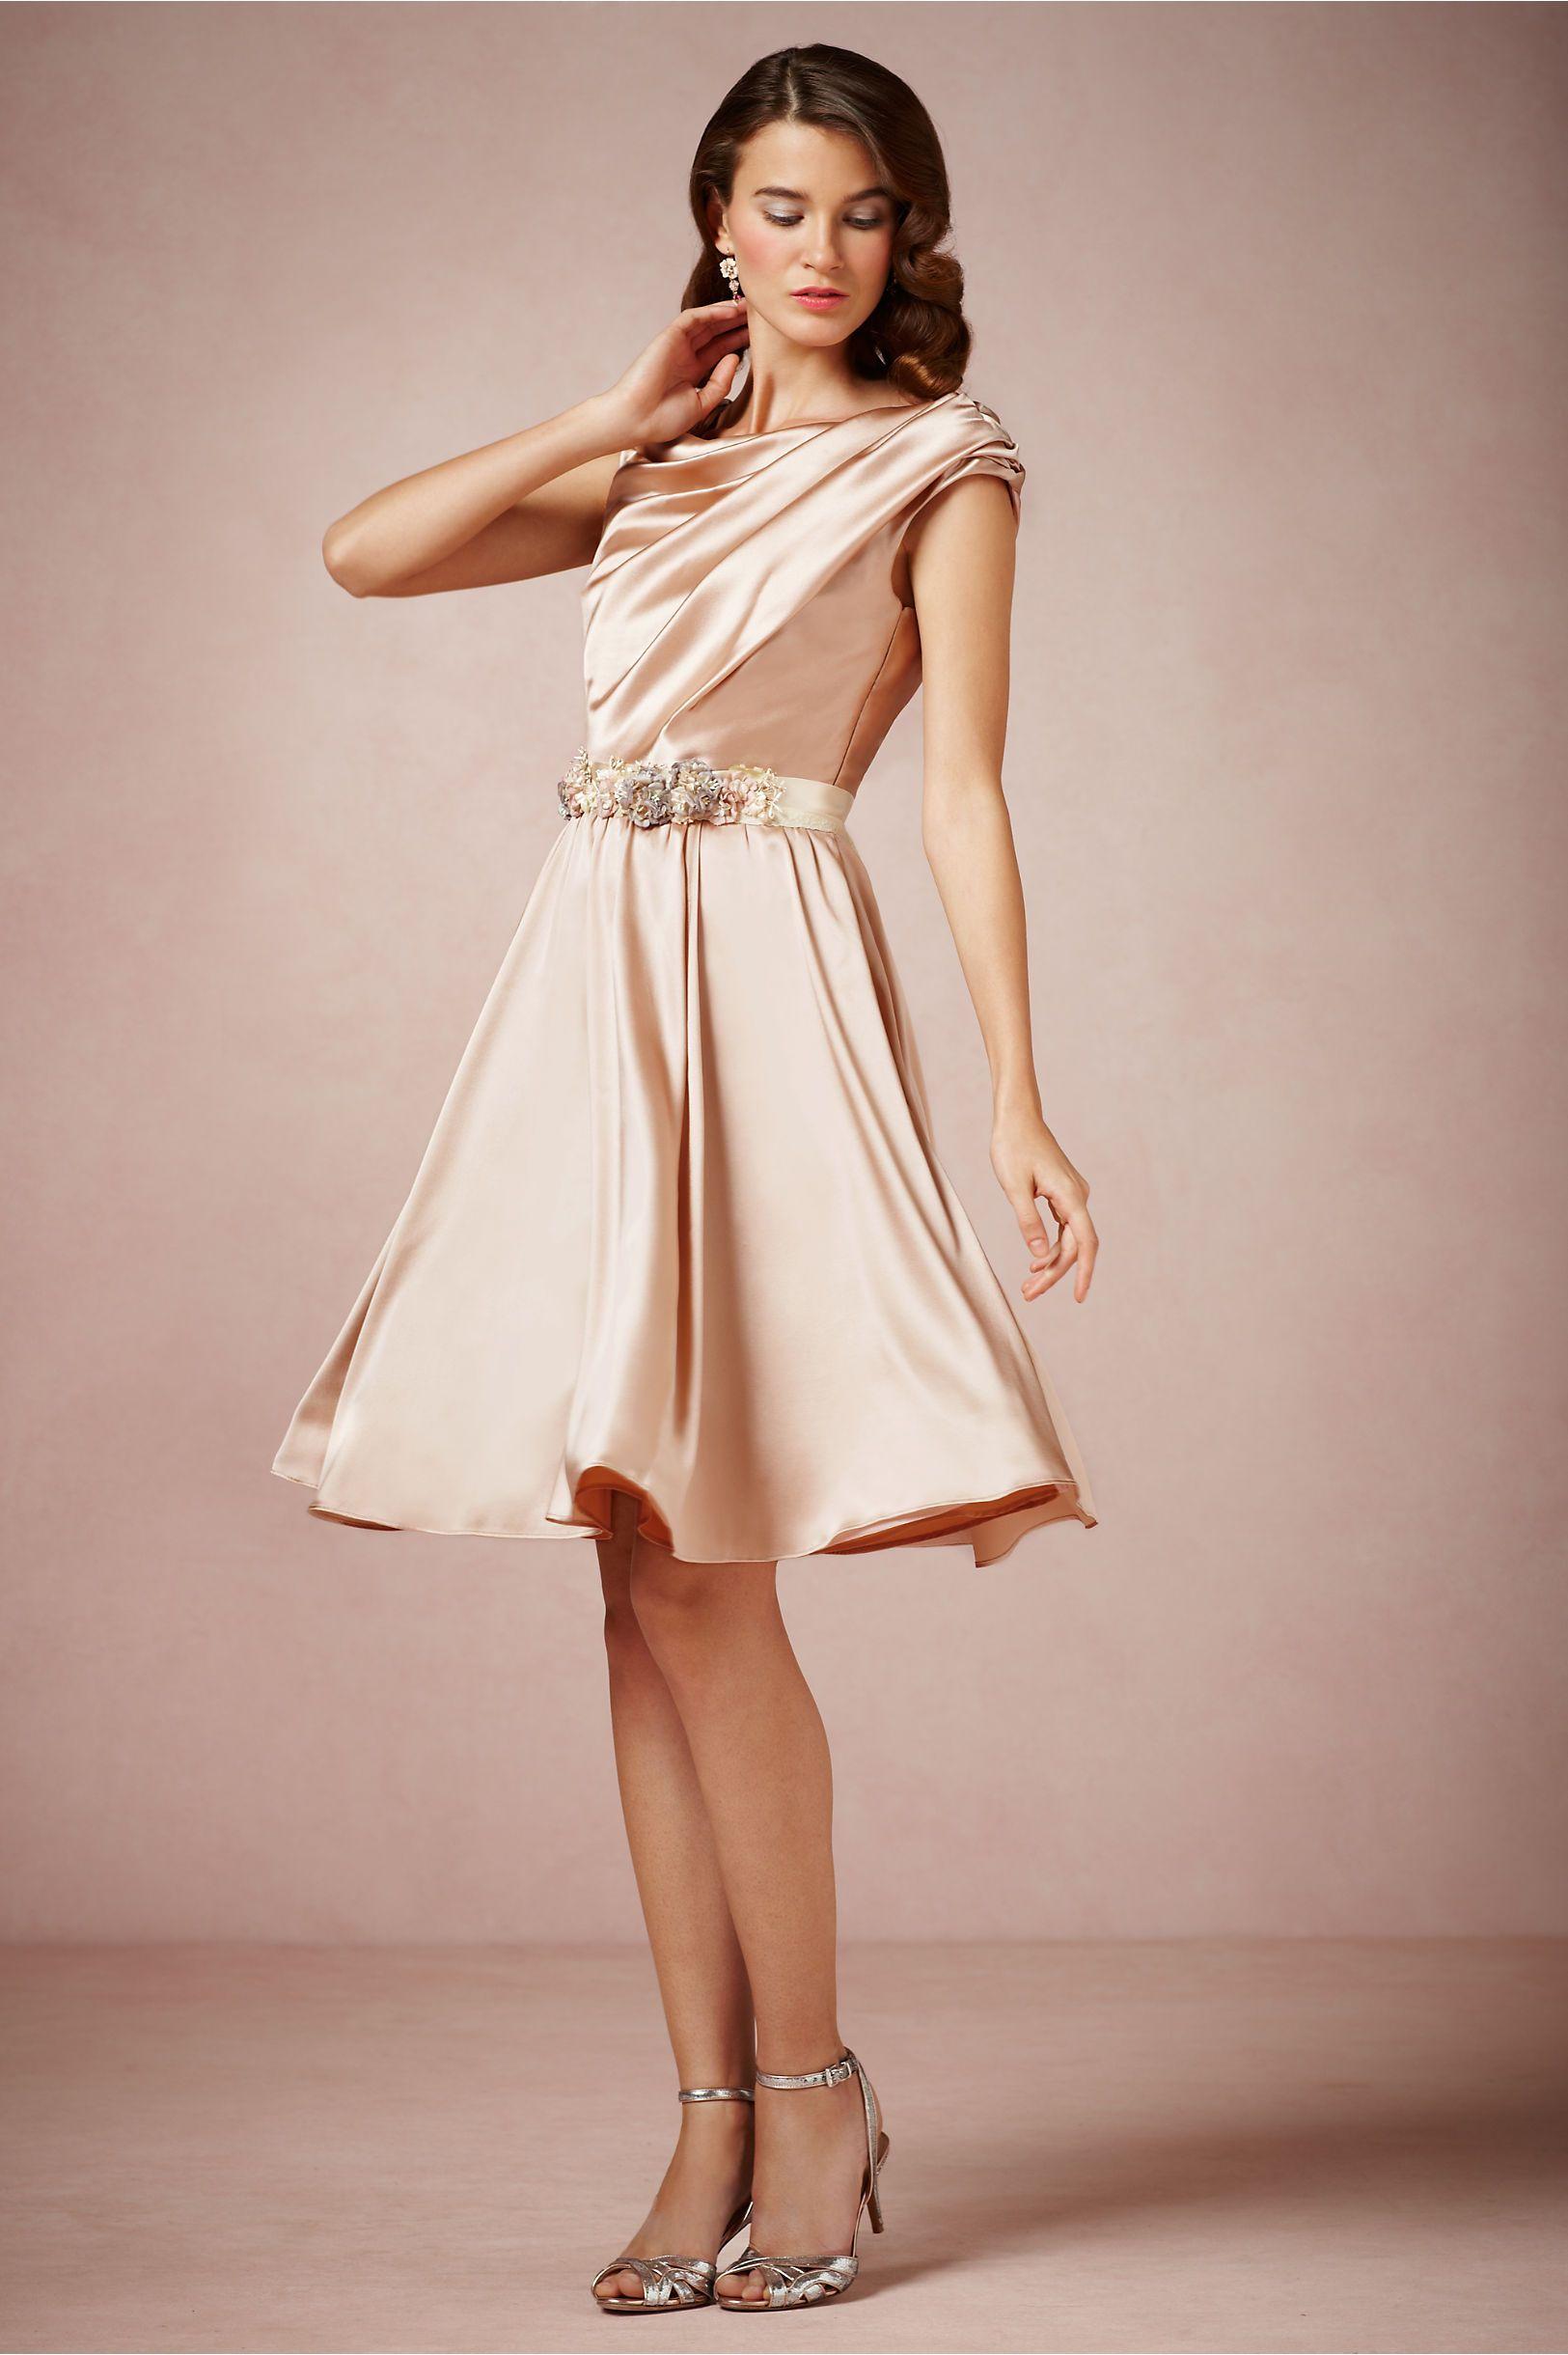 Gorgeous dress for wedding party  Exquisite Draped Silk  Fashion  Pinterest  Bridal parties Bride